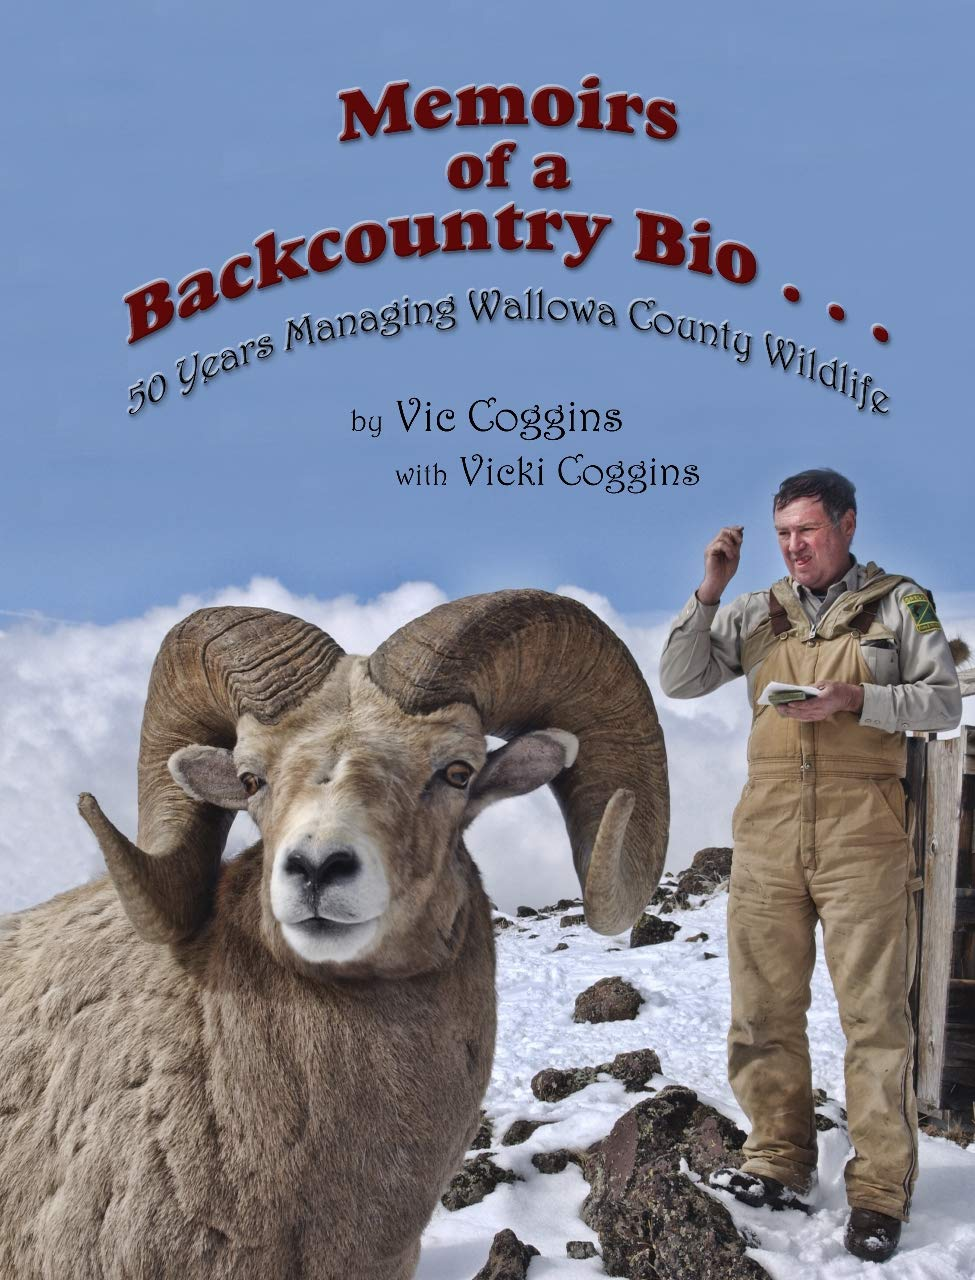 Memoirs Of A Backcountry Bio 50 Years Managing Wallowa County Nikewallowashoeexplodedviewdiagramjpg Wildlife Vic Coggins Vicki 9781641366748 Books